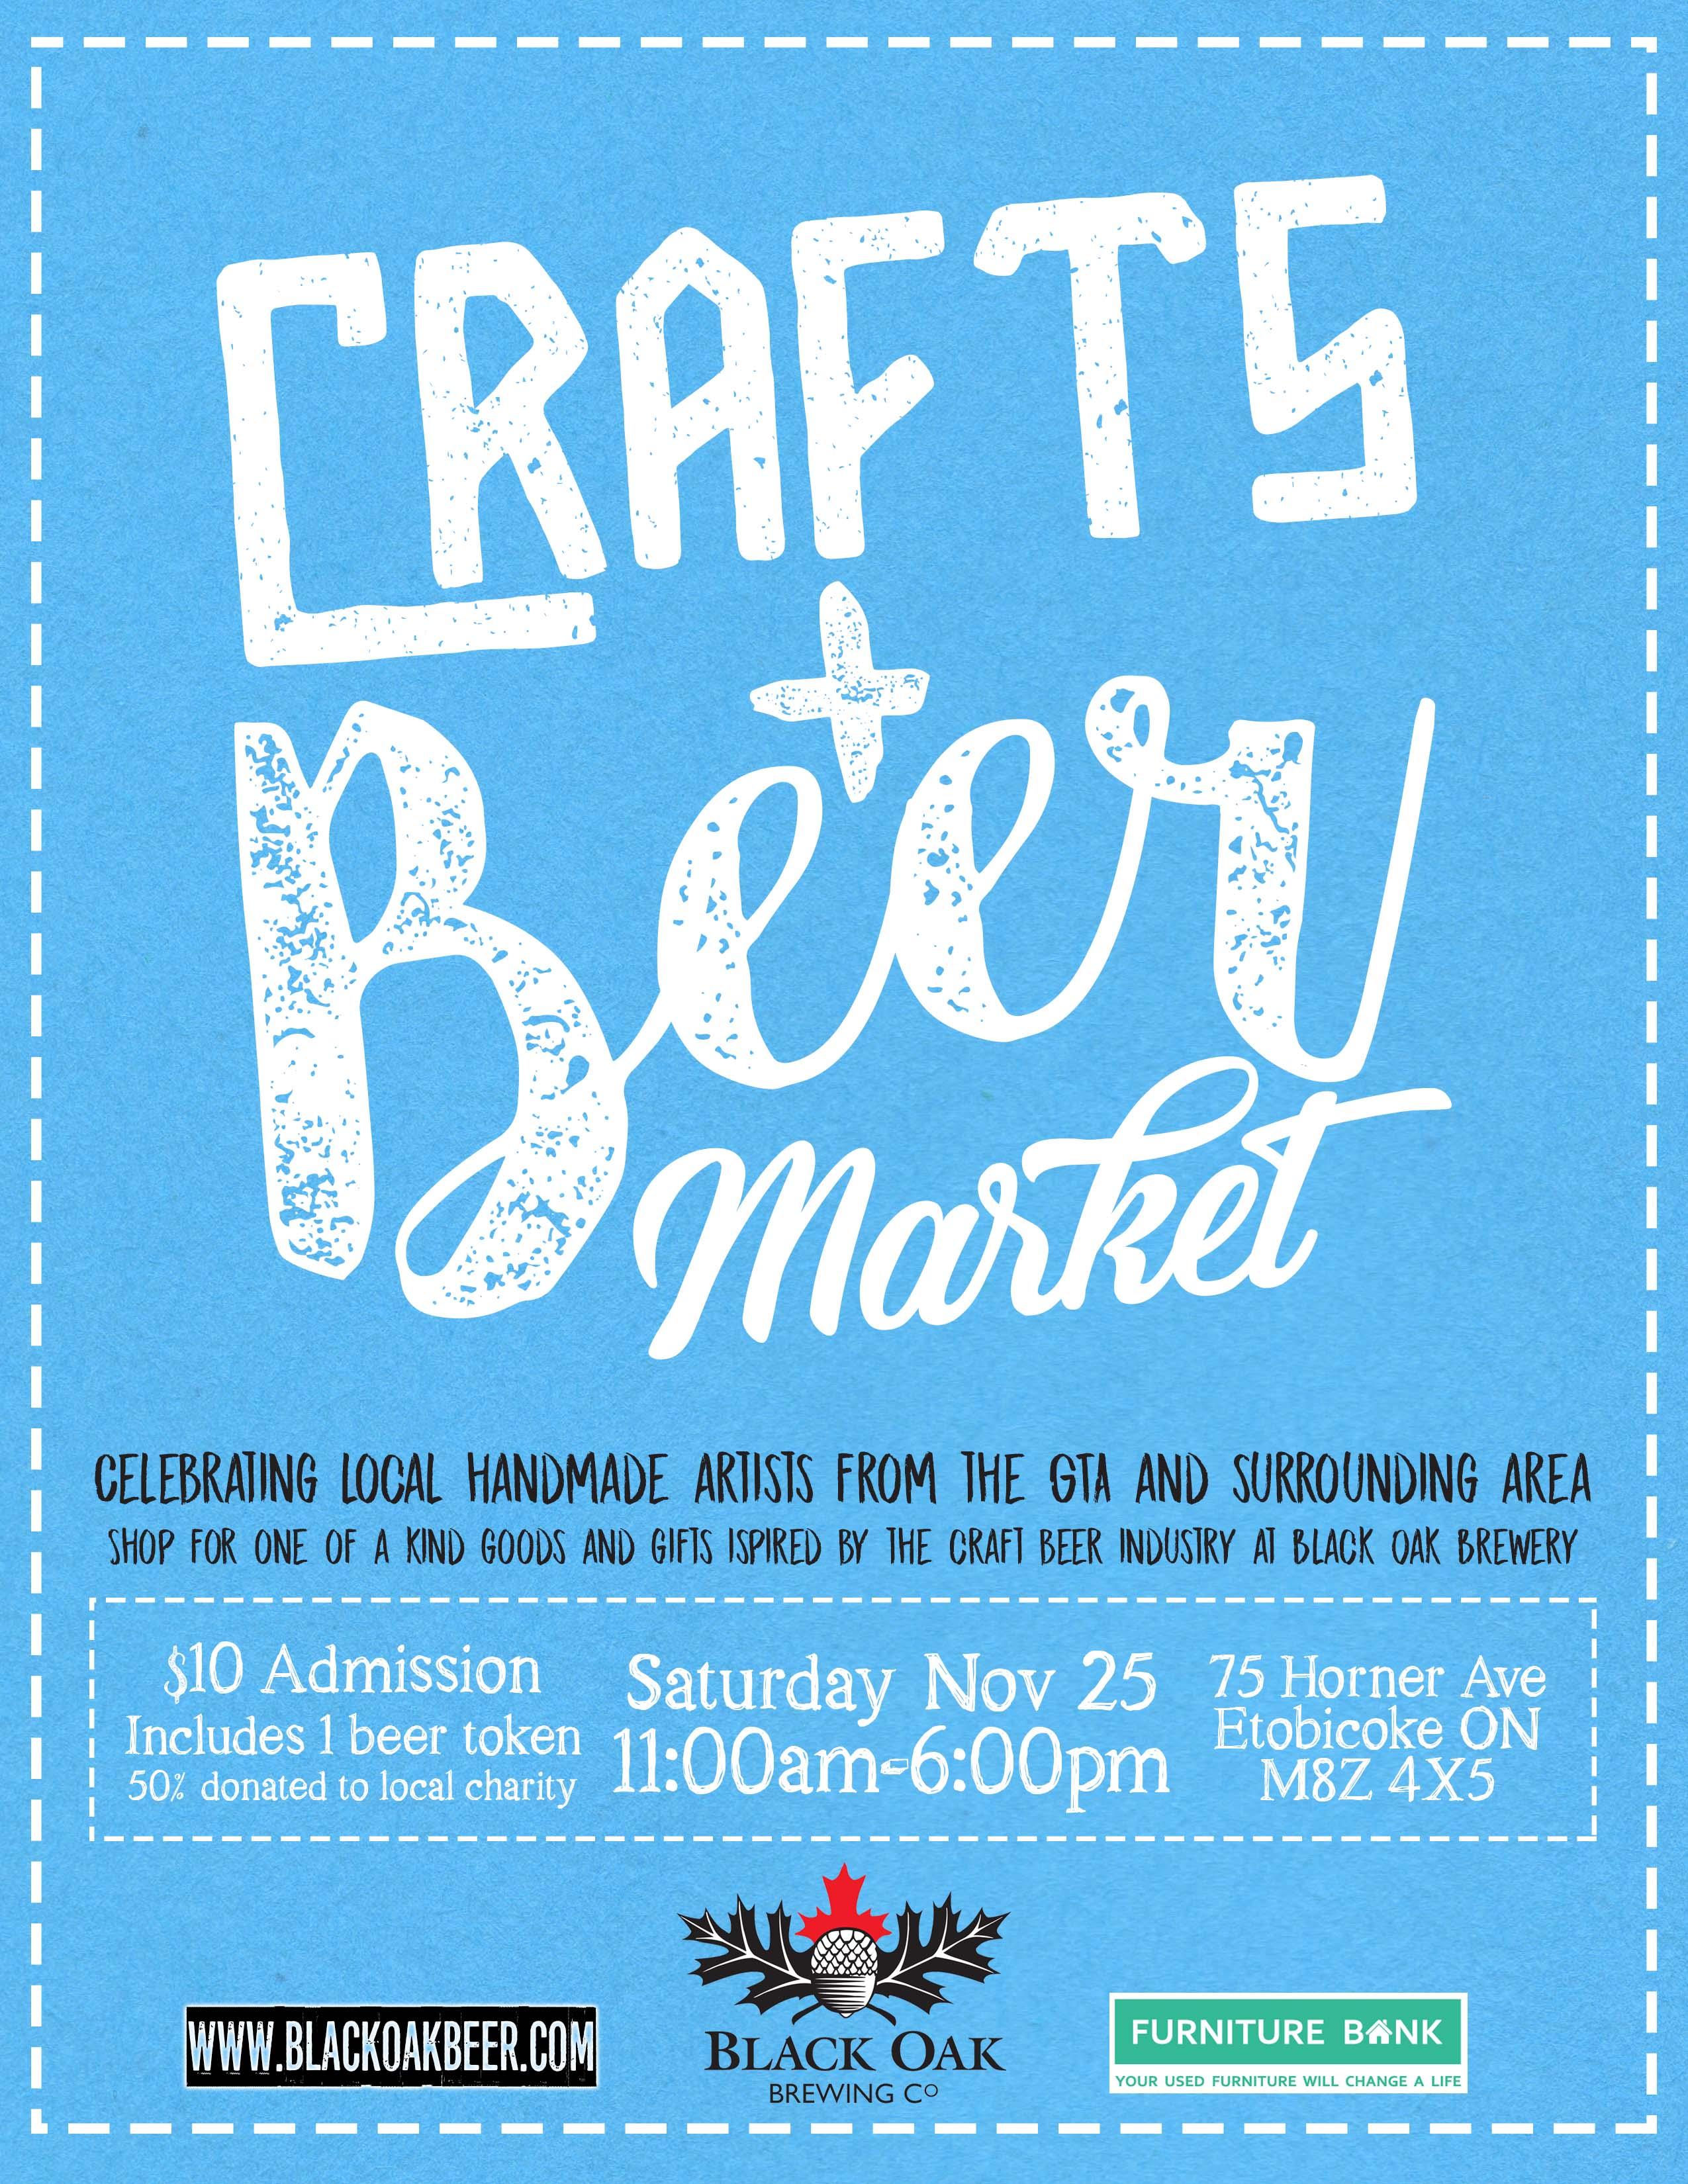 Crafts beer market at black oak brewery tickets sat 25 for Craft beer market share 2017